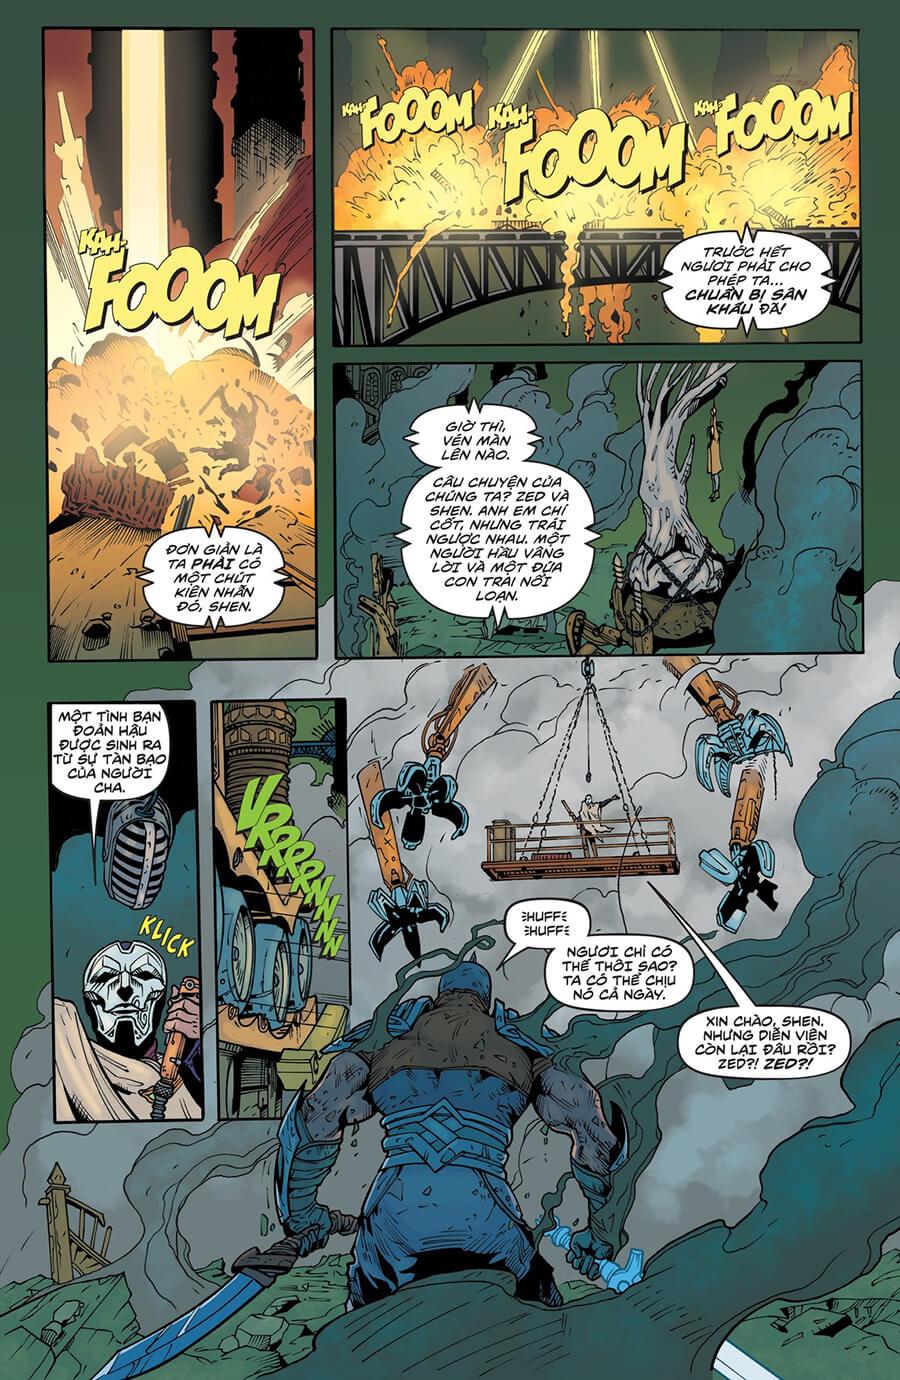 Truyện tranh Zed Kỳ 6 trang 07